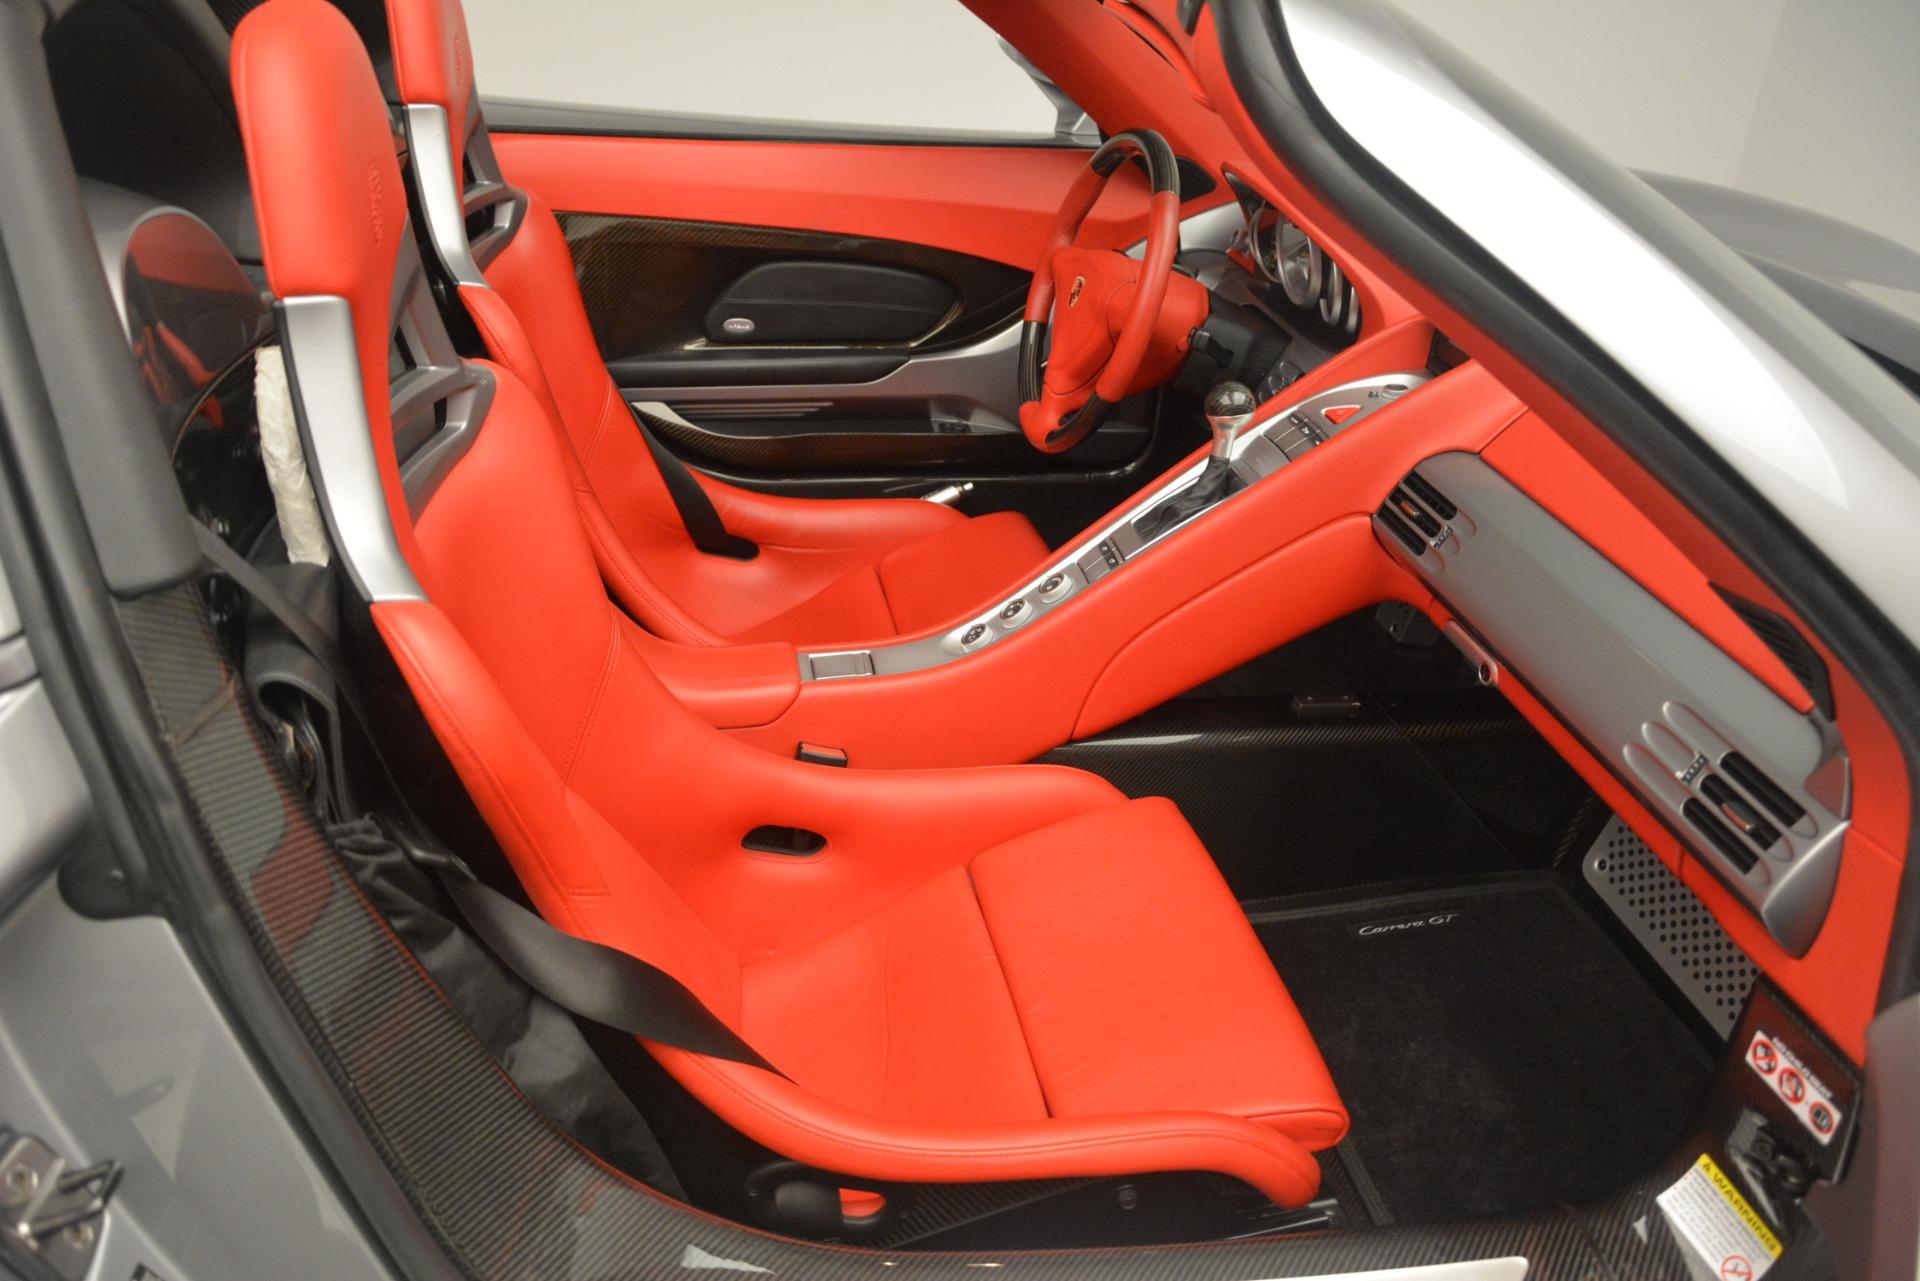 Used 2005 Porsche Carrera GT  For Sale In Greenwich, CT 3161_p31